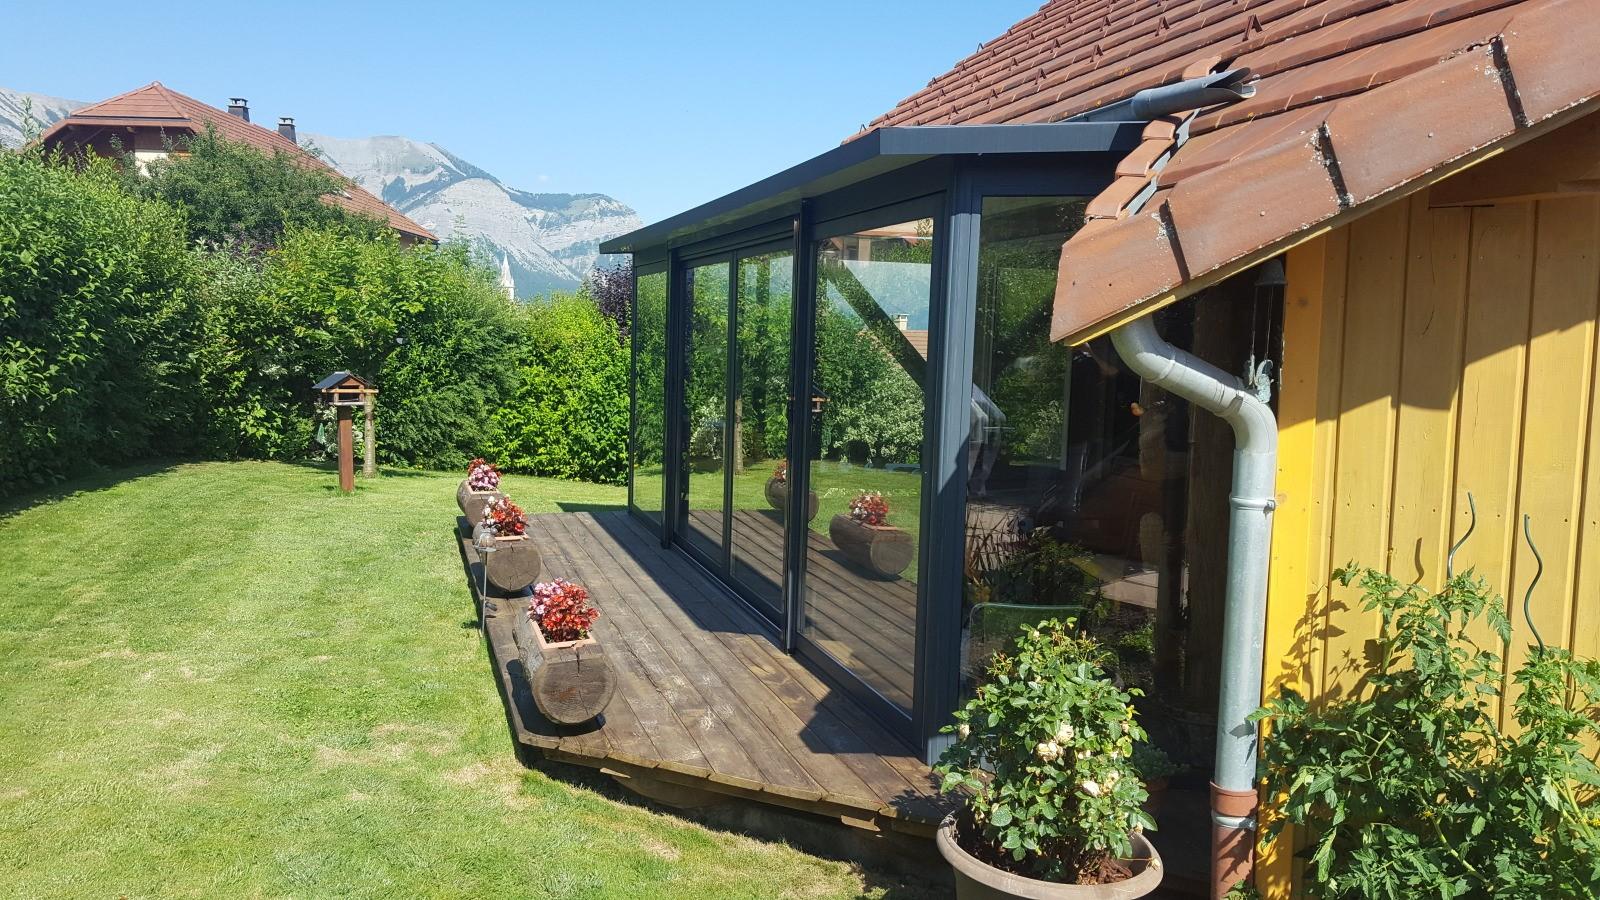 Comment installer un jardin d\'hiver dans sa véranda ? | Komilfo